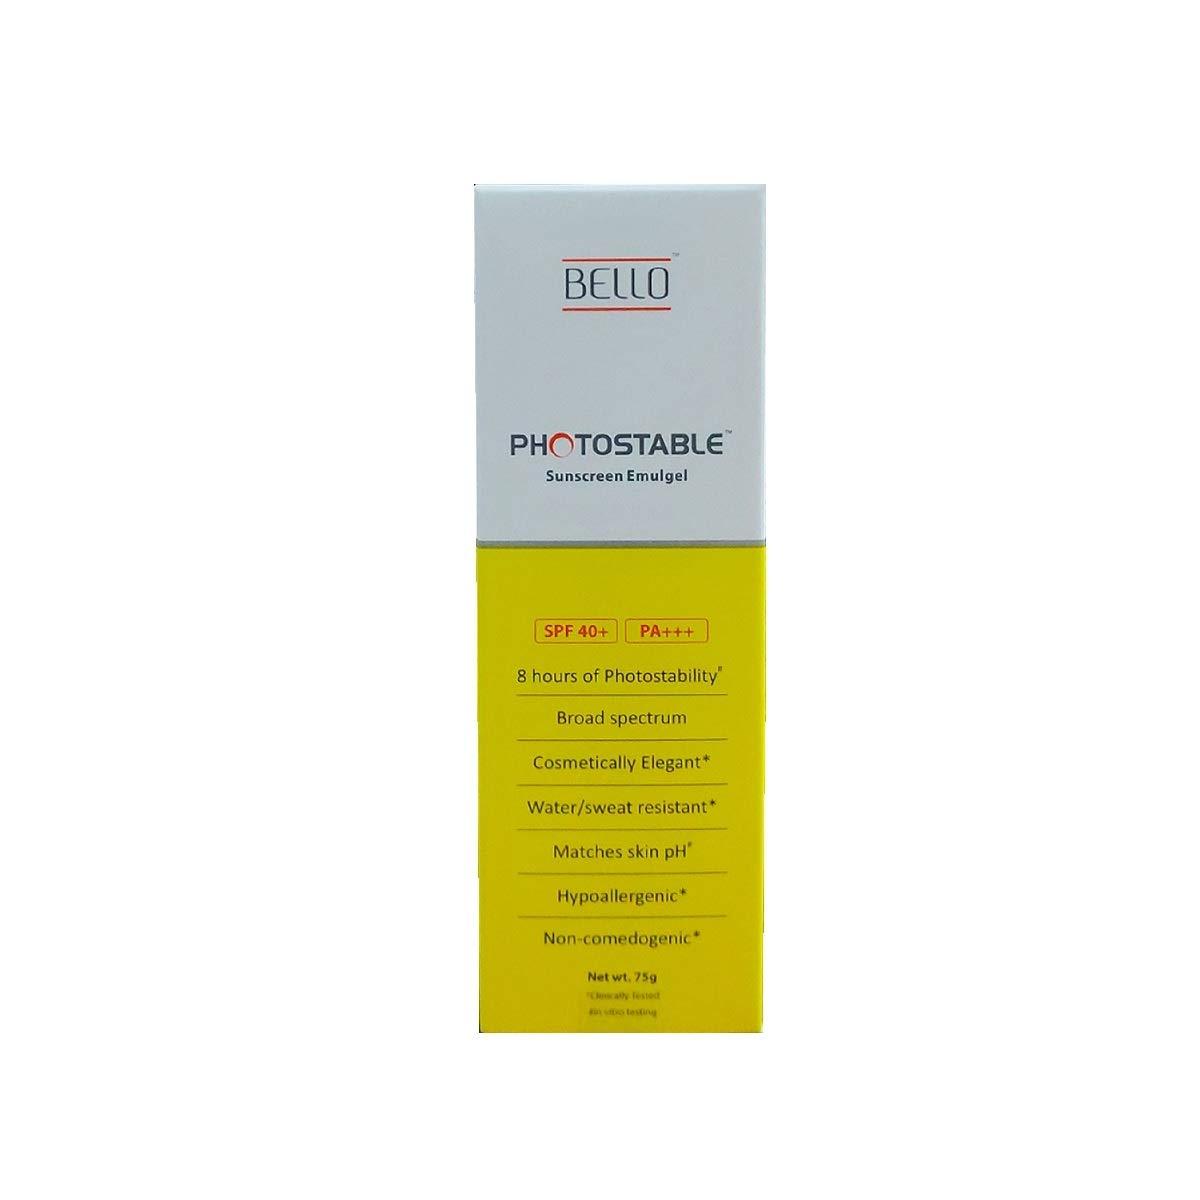 photo stable Bello SPF 40+ Pa+++ Sunscreen Gel (75 g)